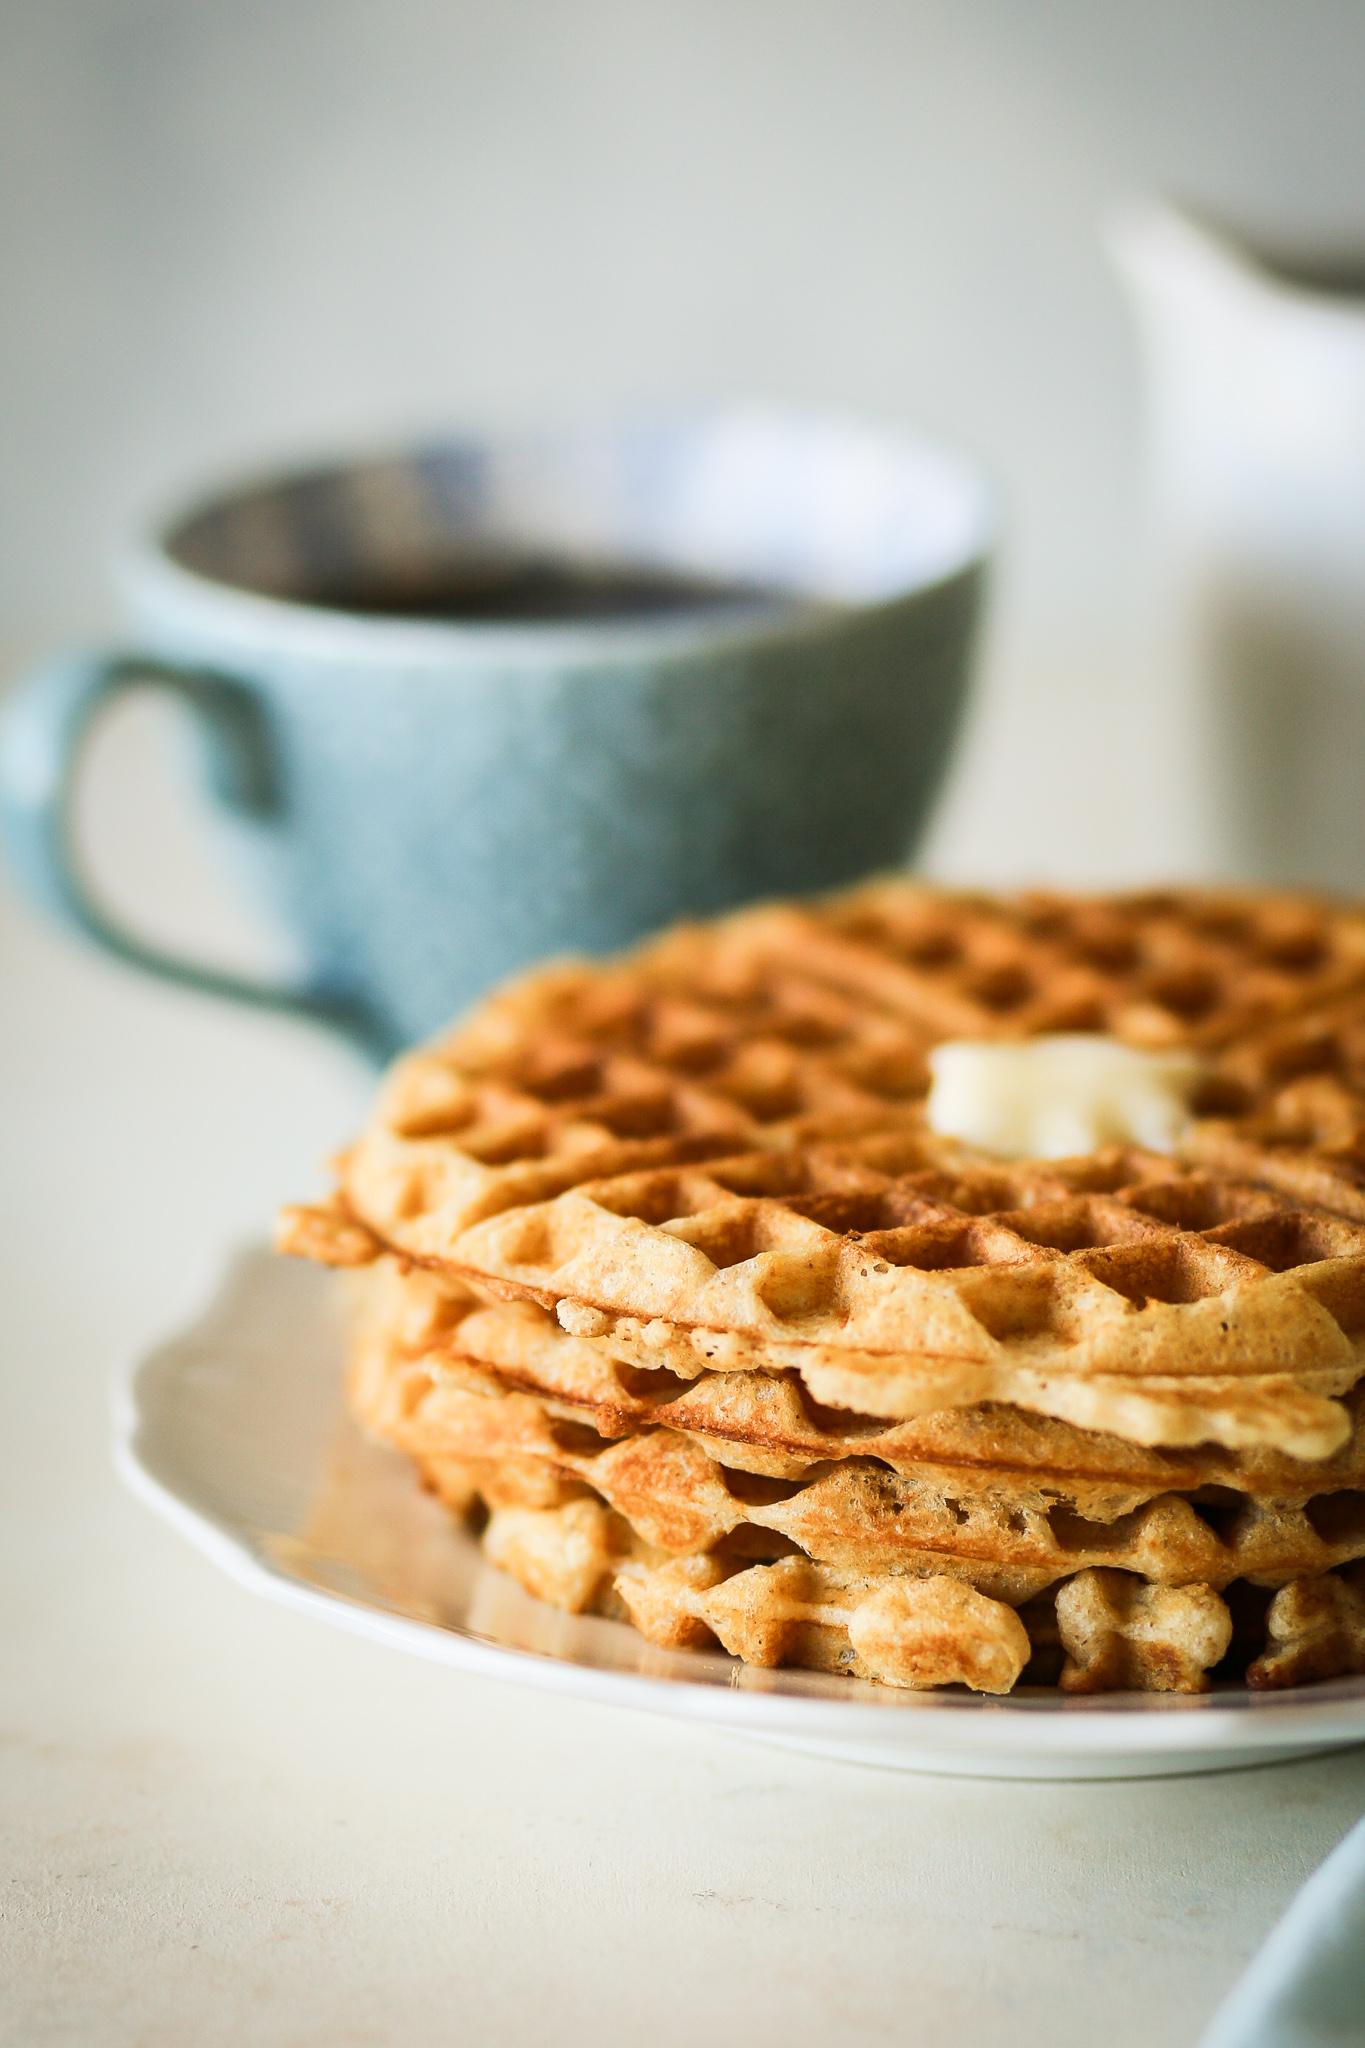 Brown Butter Vanilla Waffles | Set the Table #waffles #wafflerecipe #brownbutter #vanilla #breakfast #brunch #holidays #holidayrecipe